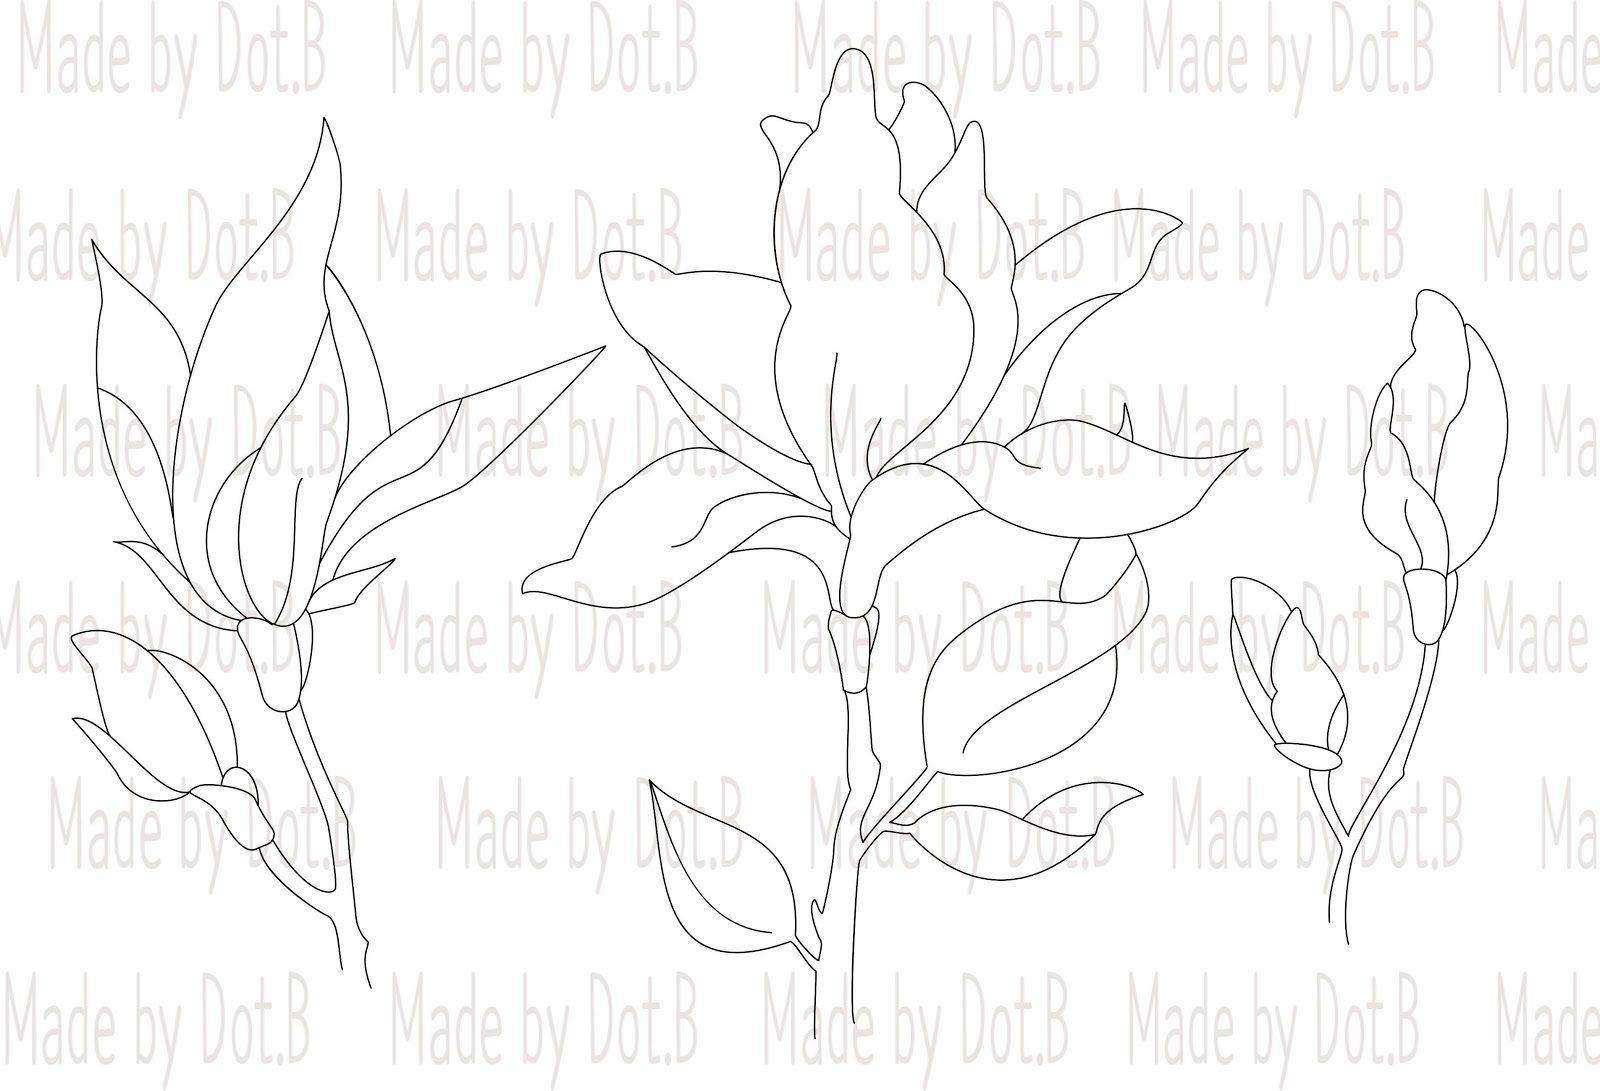 magnolia3ef674c9fd176649c89f9051e814eea51265cffdec397d743062752c782d724e2bwatermark-5388597